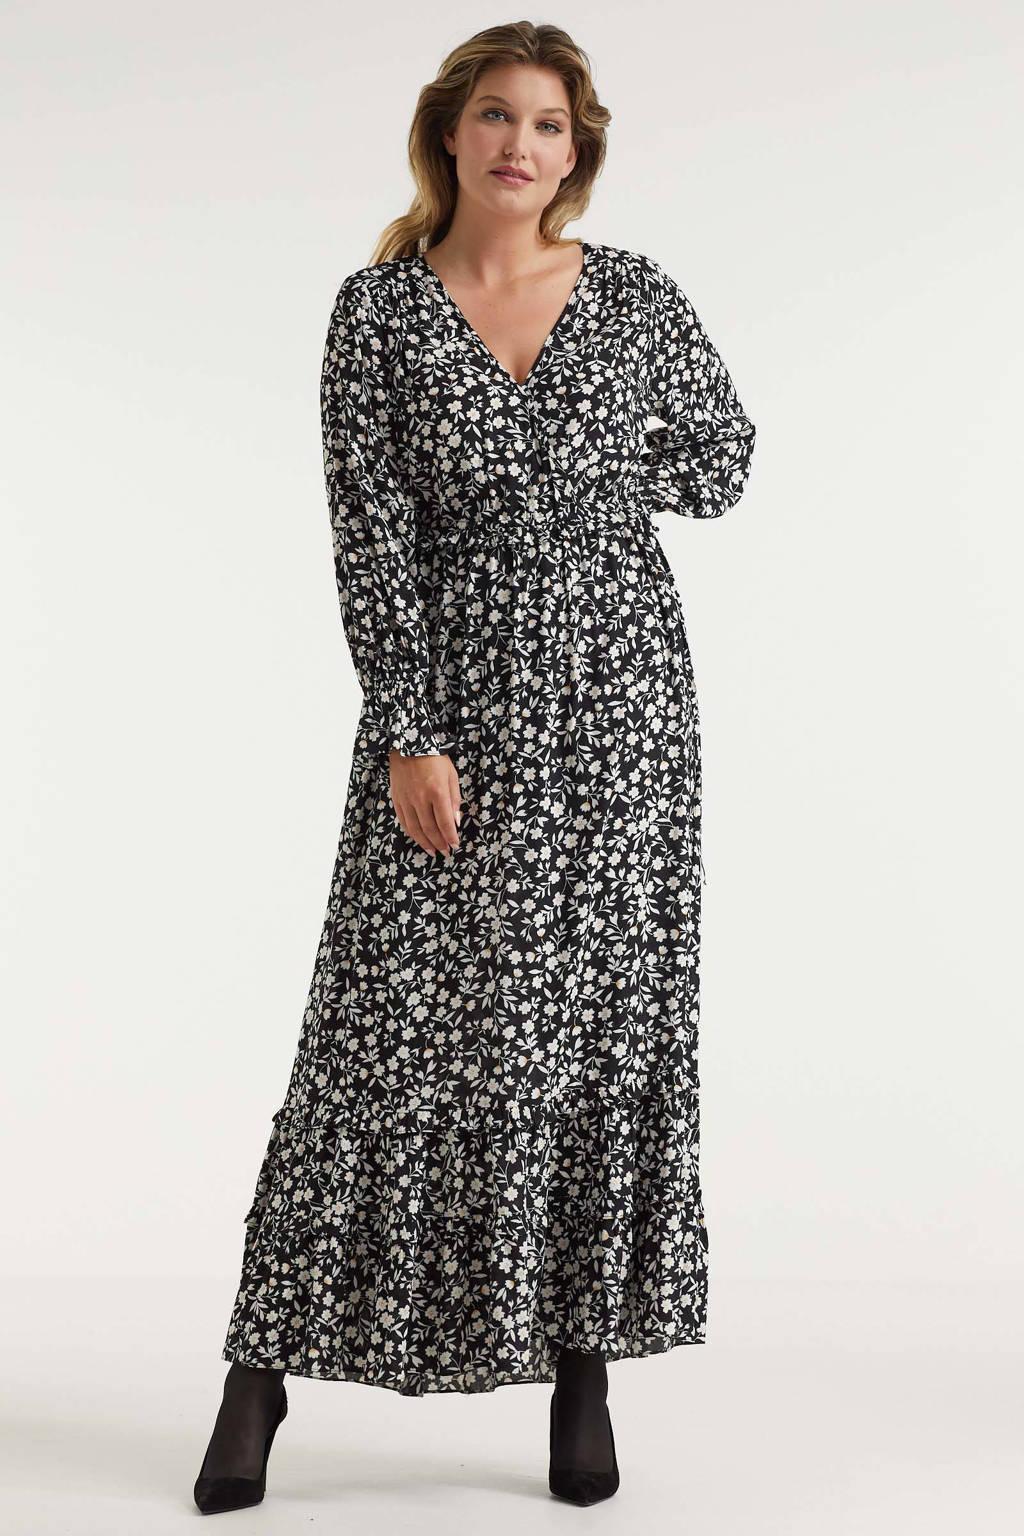 Miljuschka by Wehkamp maxi jurk met mini bloemenprint zwart/wit, Zwart/wit